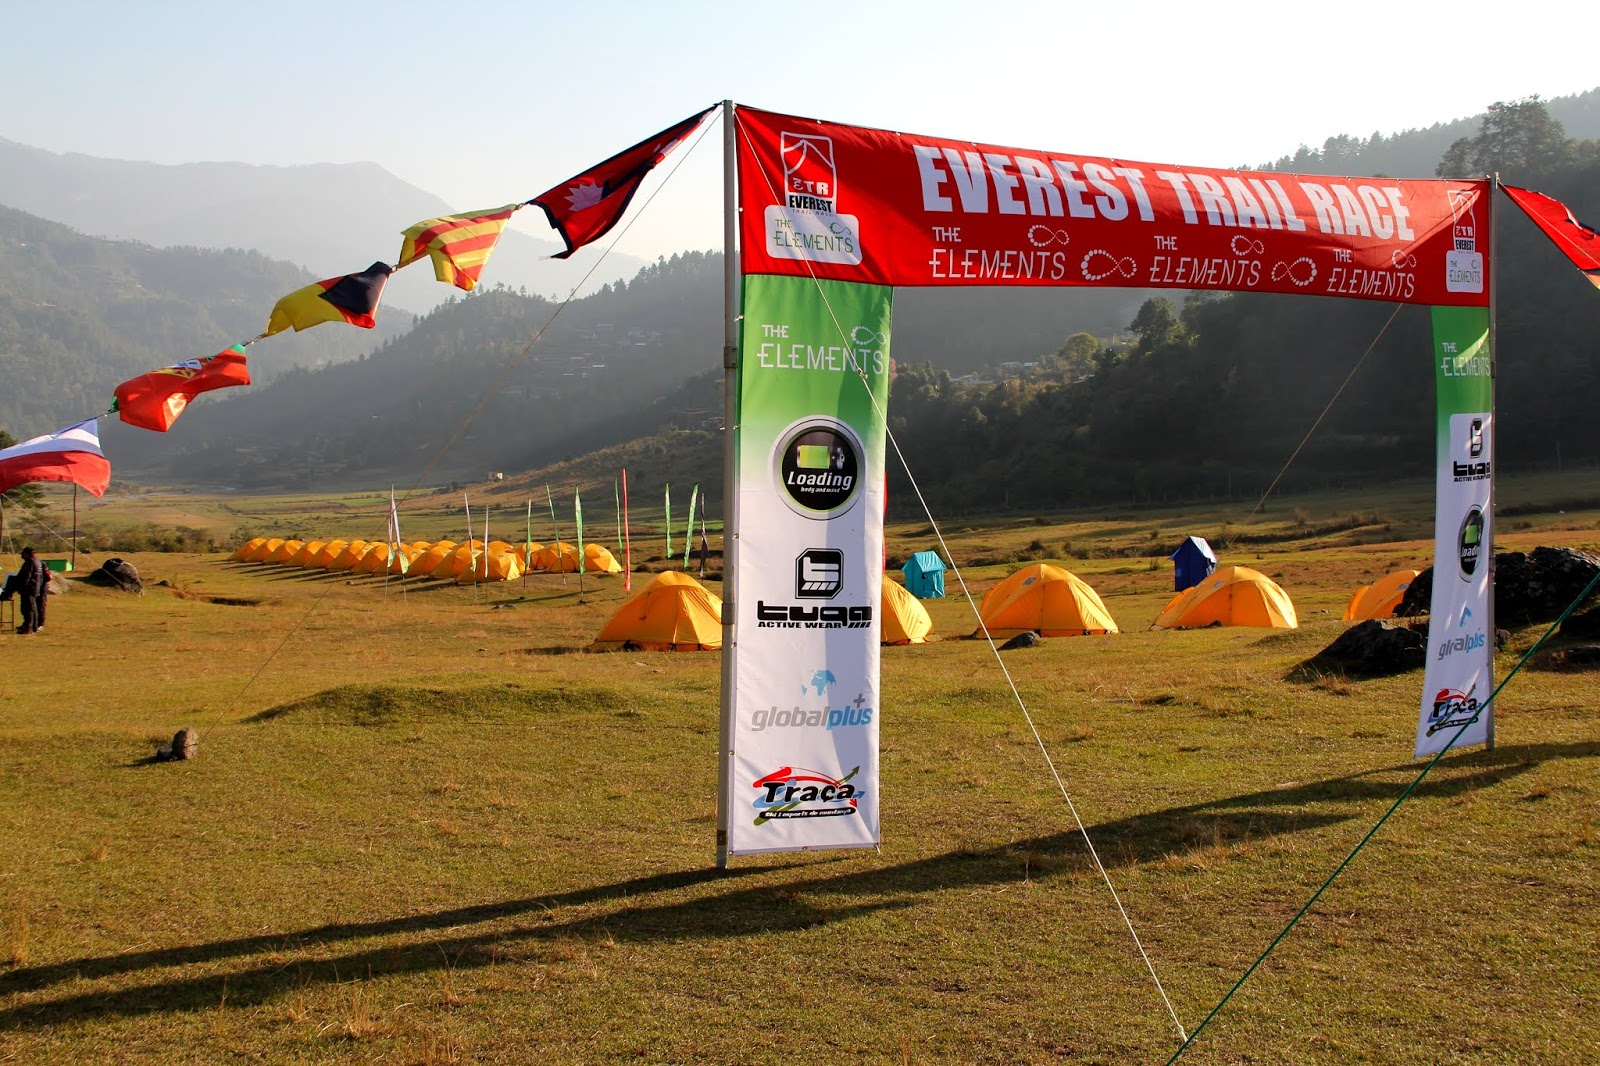 Everest Trail Race 2018